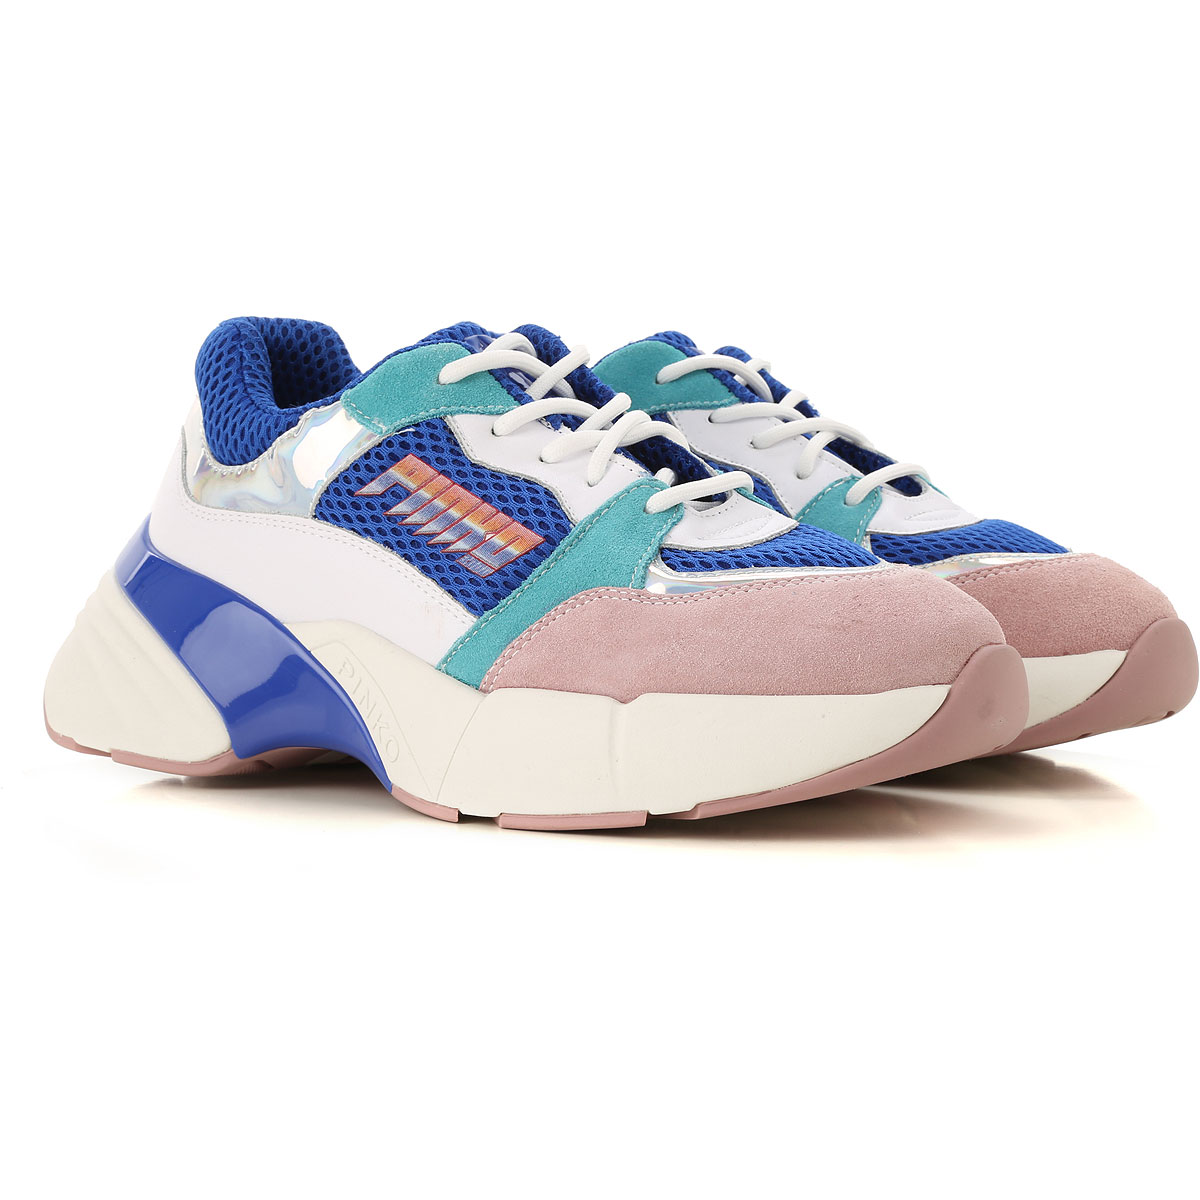 1573ee163cca Womens Shoes Pinko, Style code: 1h20lzy5br-ezn-zaffiro